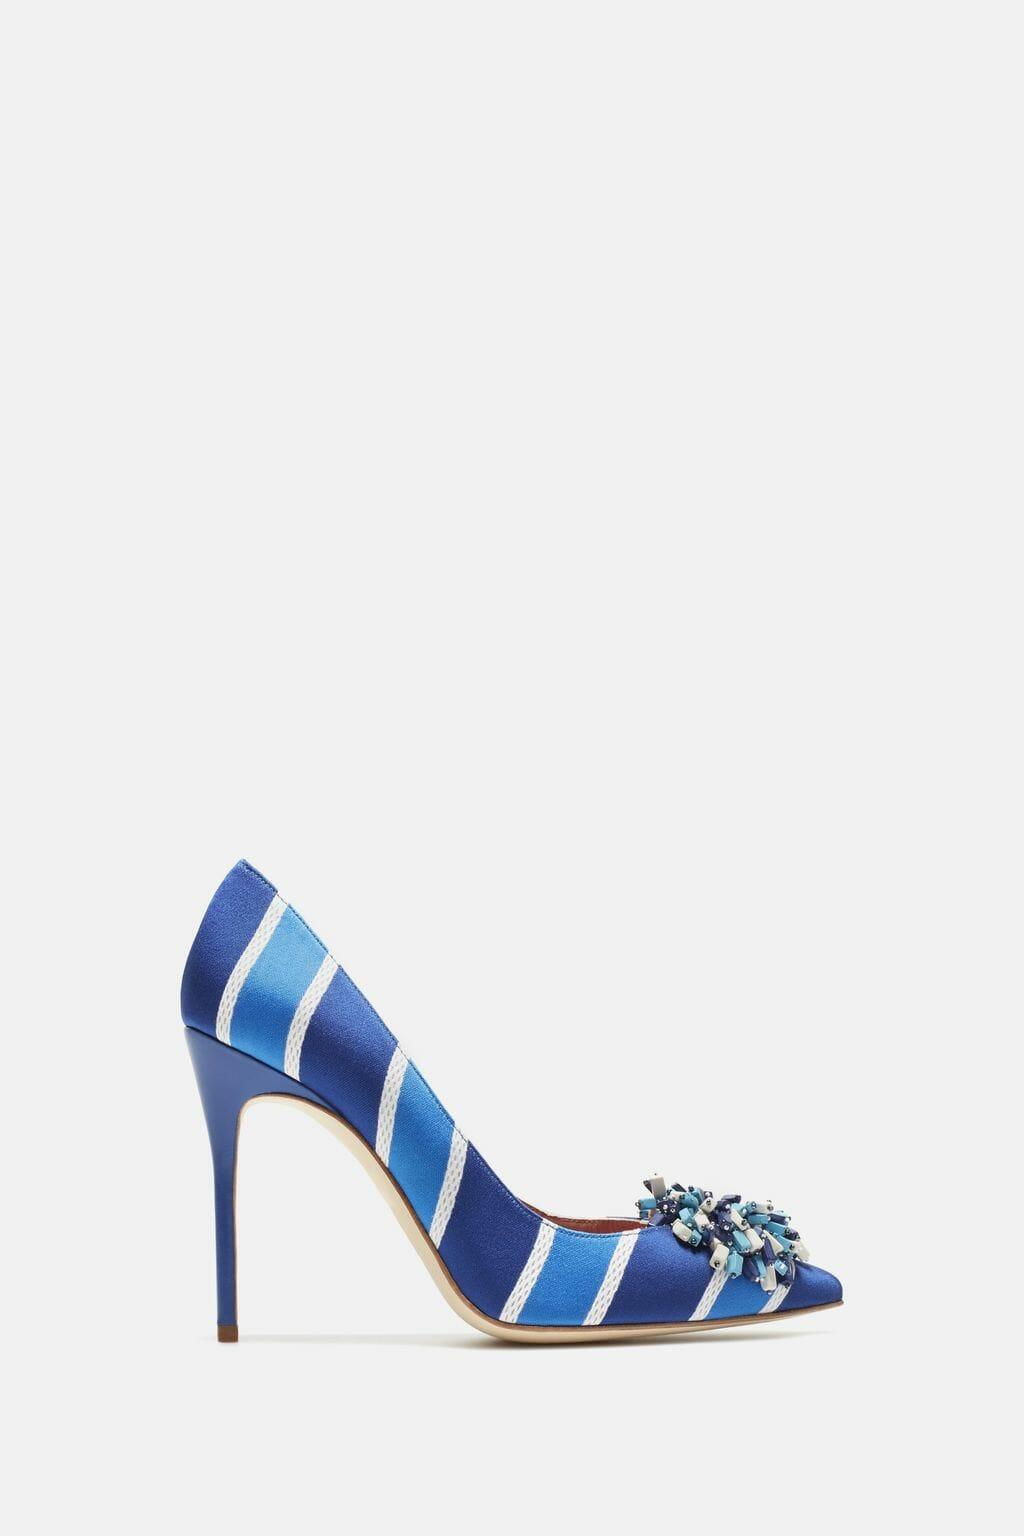 CH-Carolina-herrera-shoes-collection-Spring-Summer-2018-shoe-7